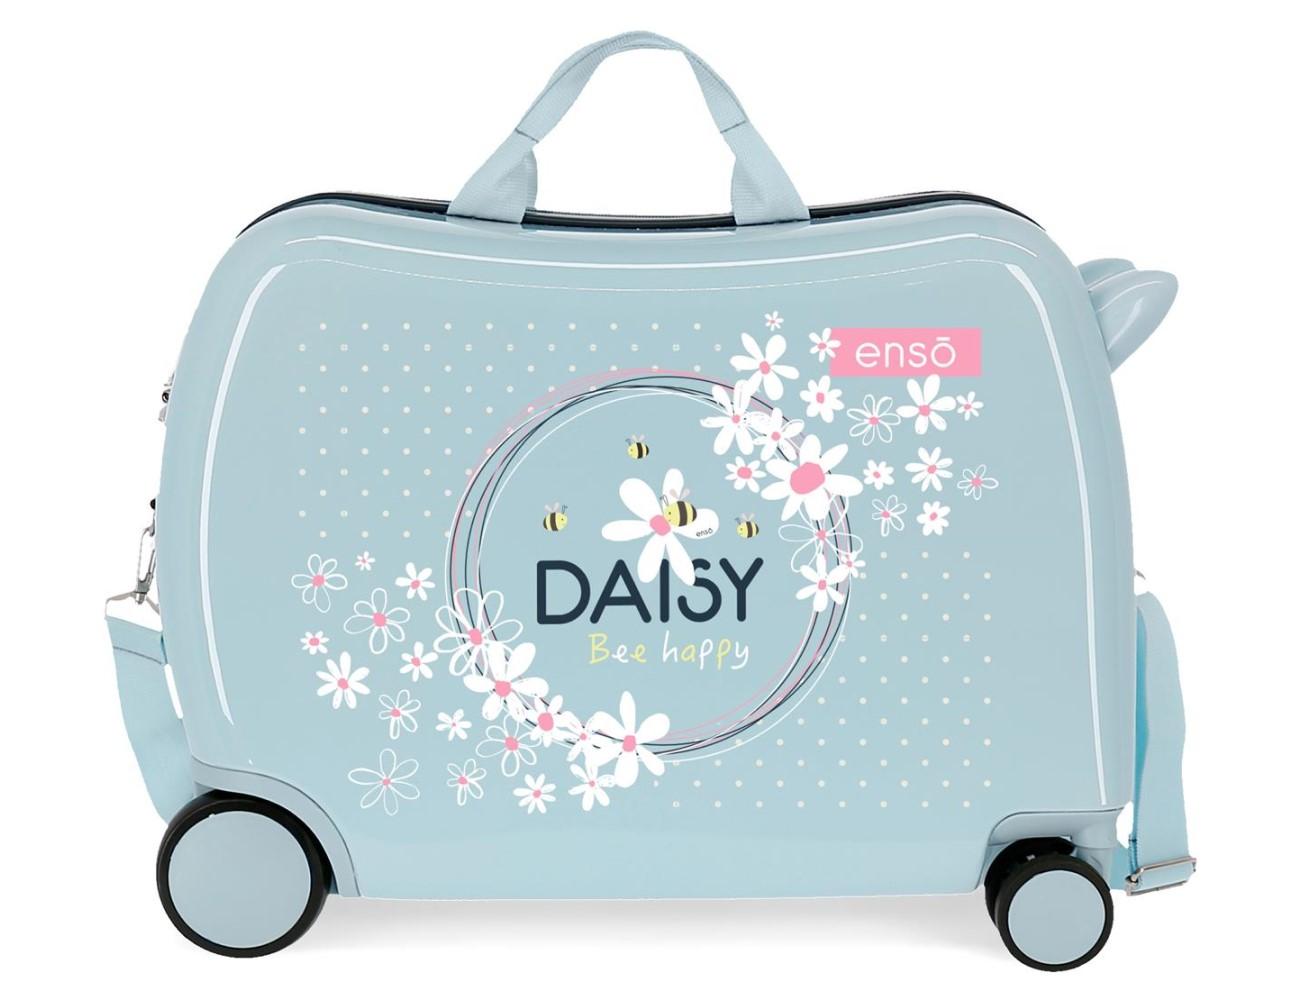 Maleta Infantil Enso Daisy Azul 9259821